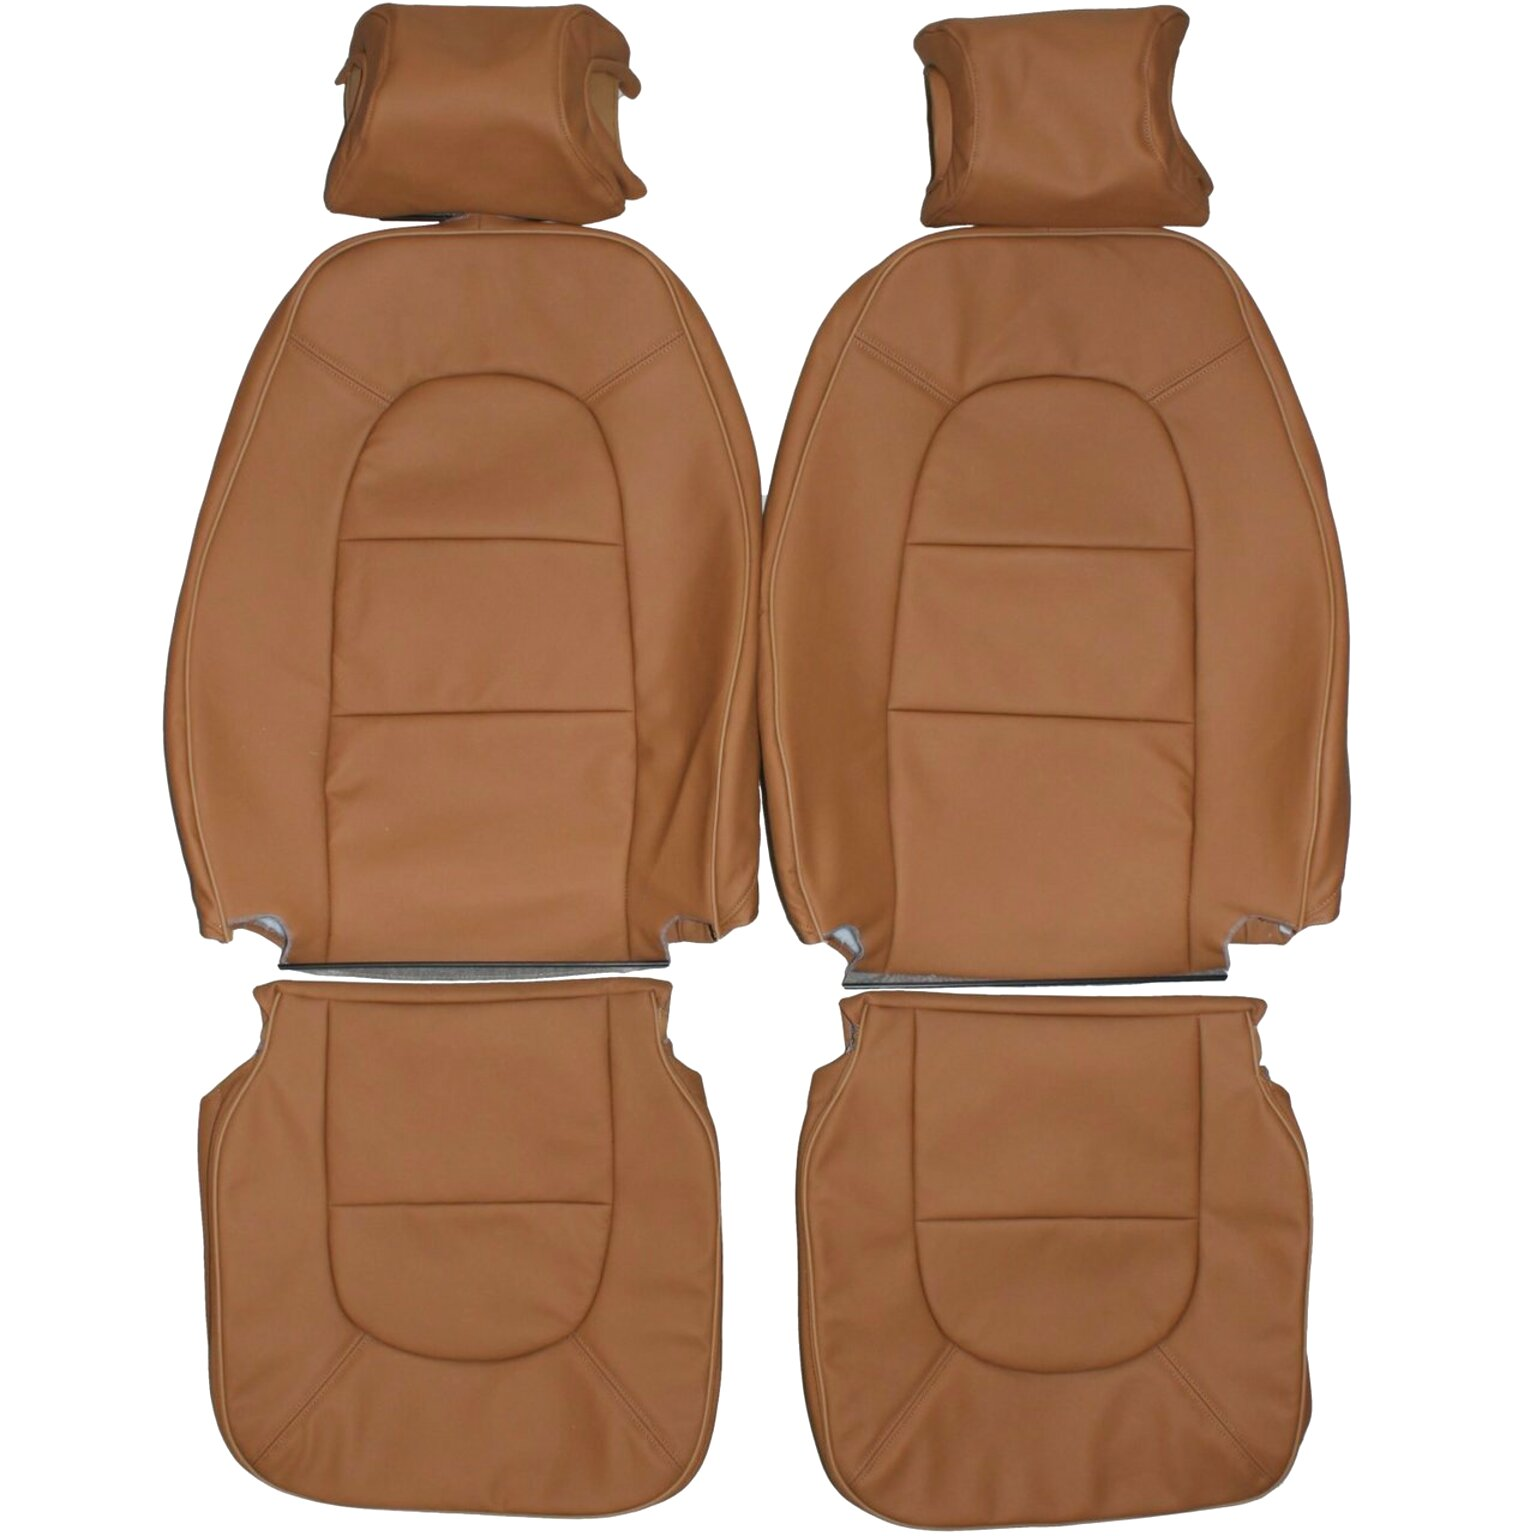 saab 900 leather seats for sale